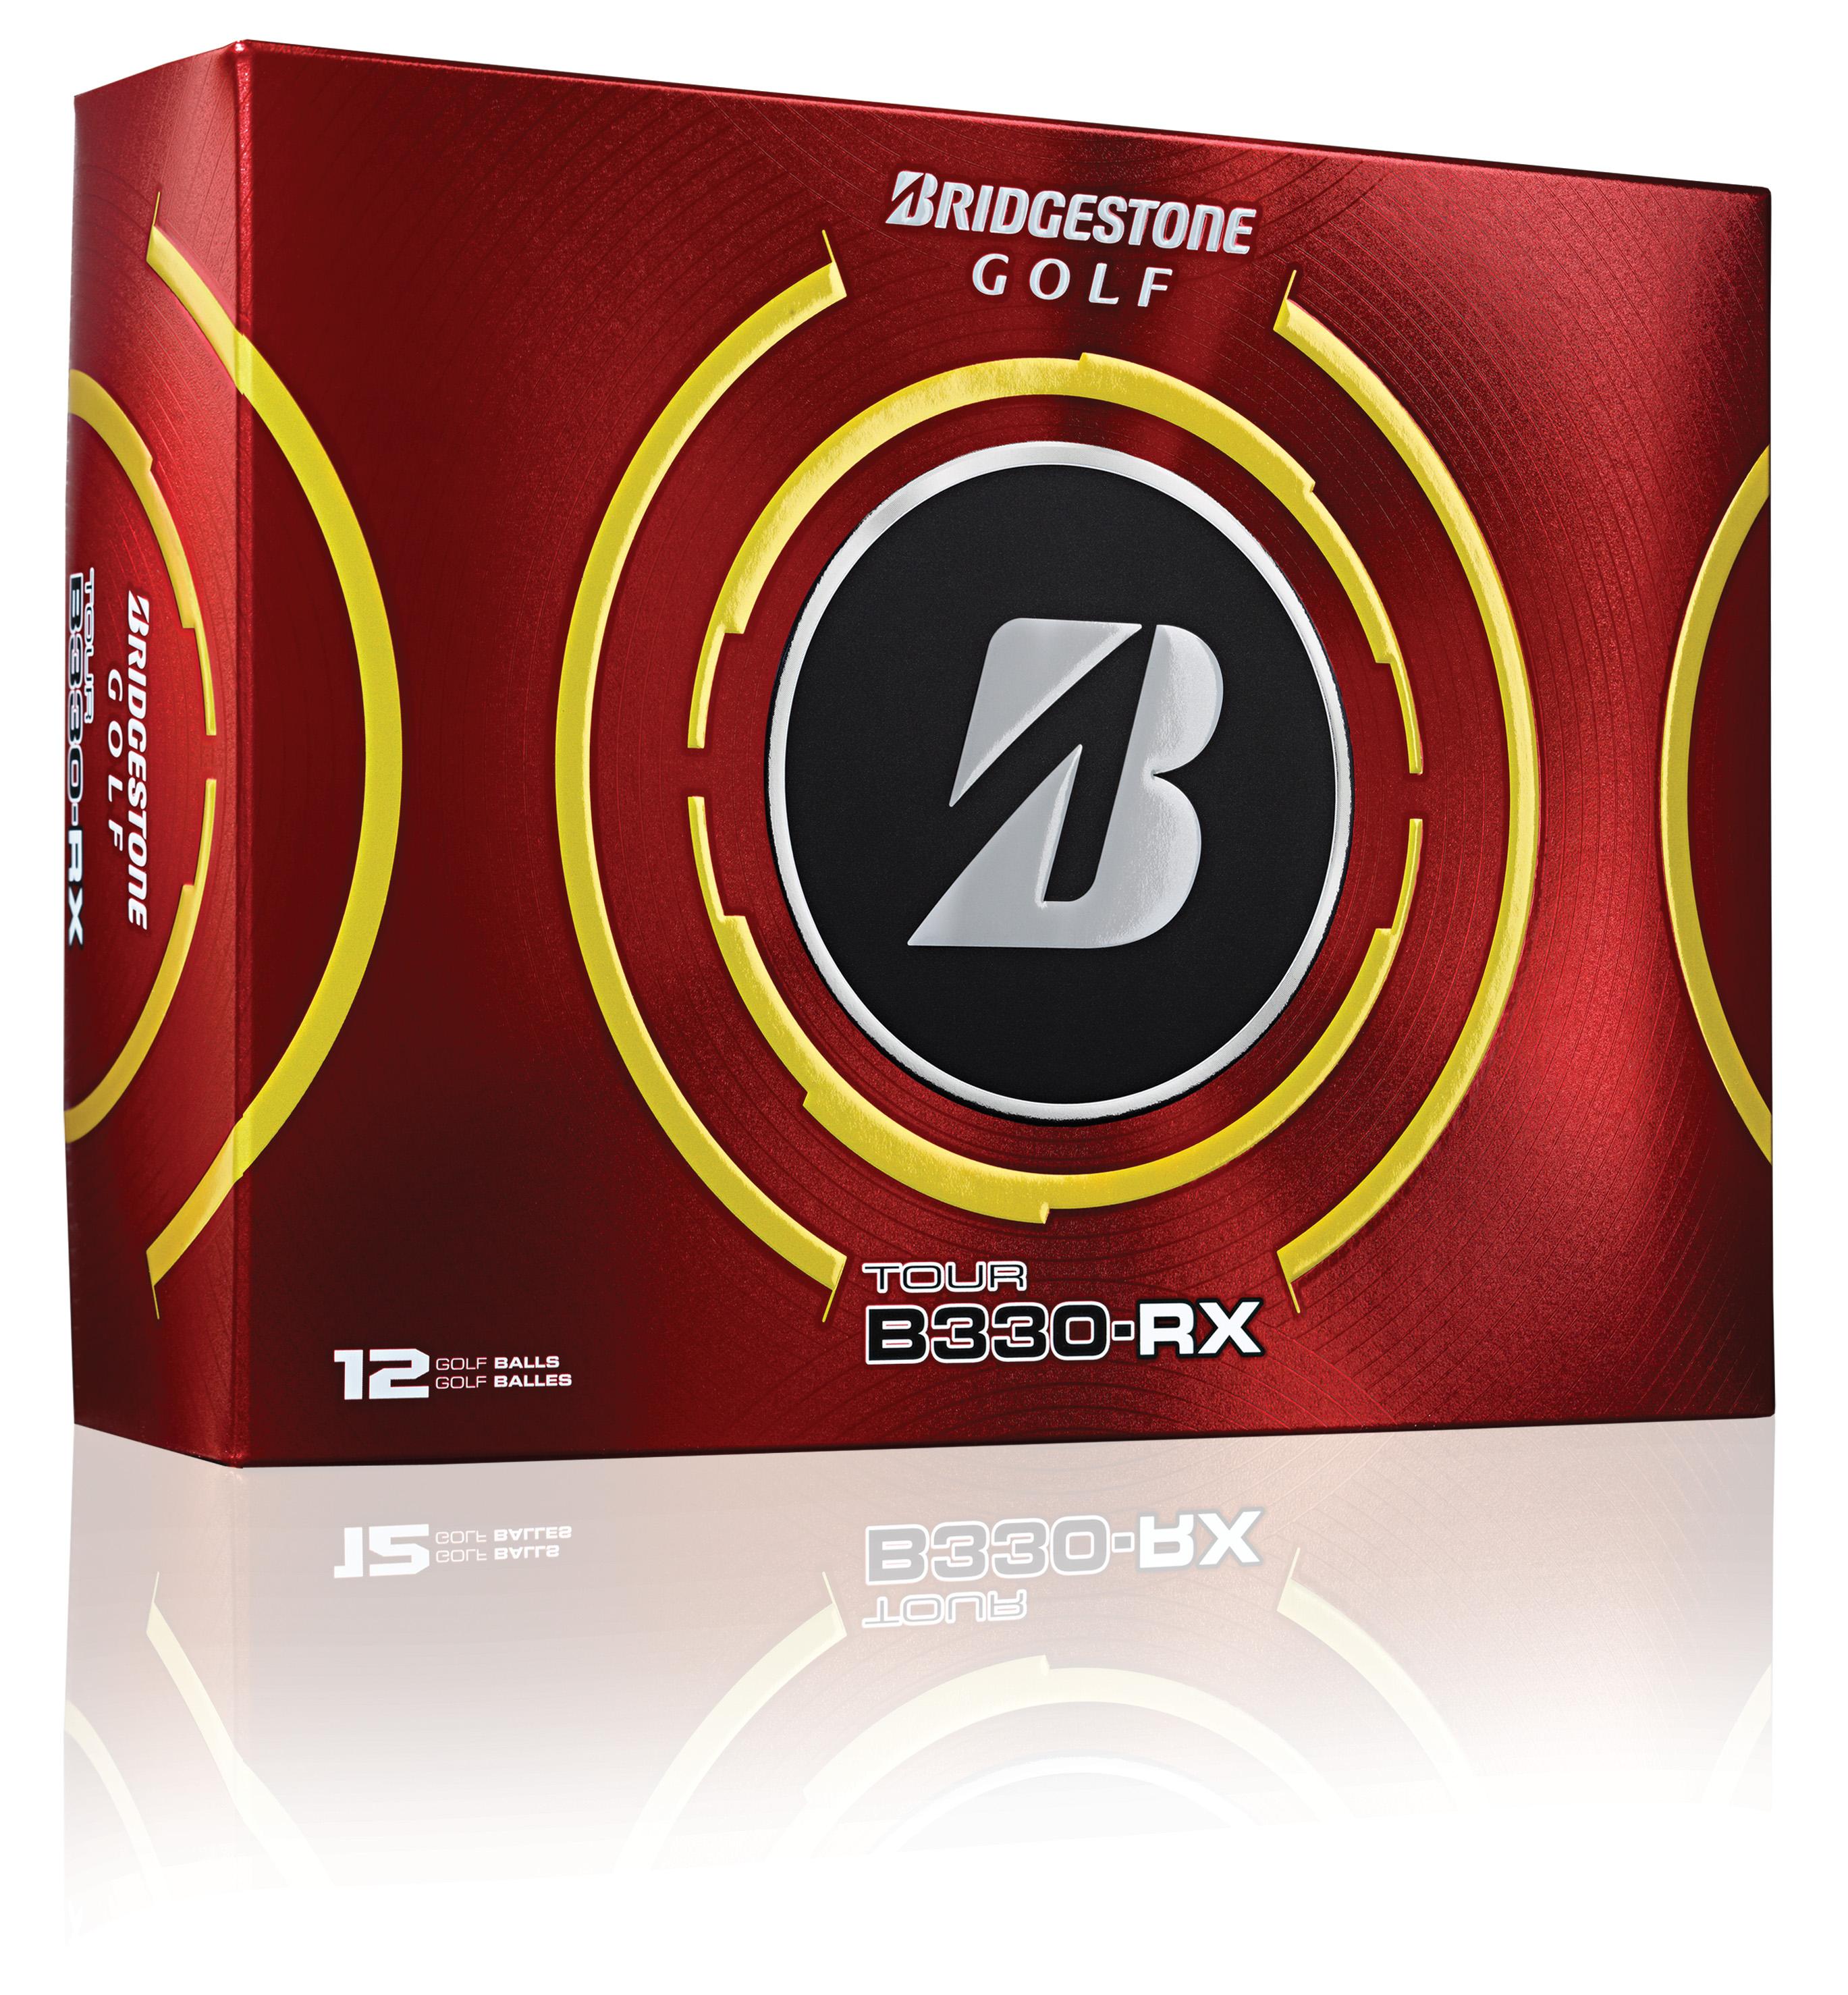 BSG B330 RX_2012